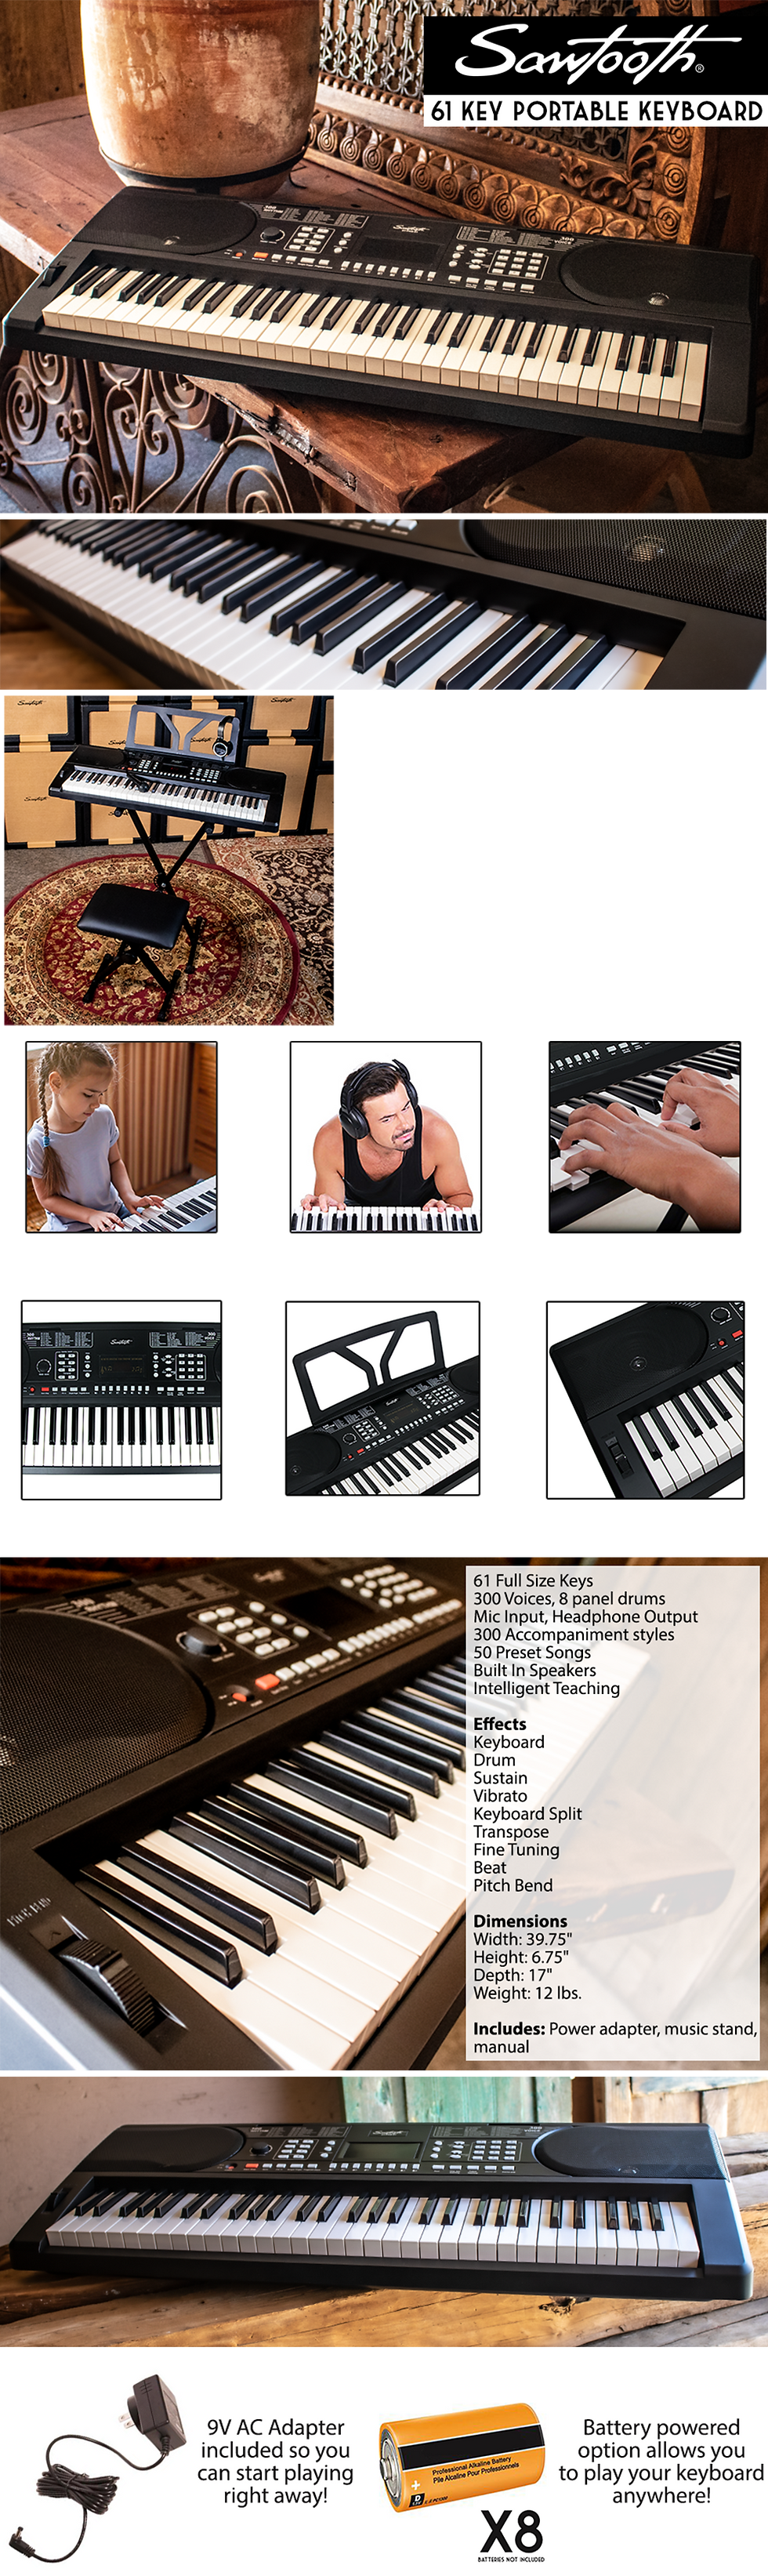 61 Key Keyboard Rich Data.png